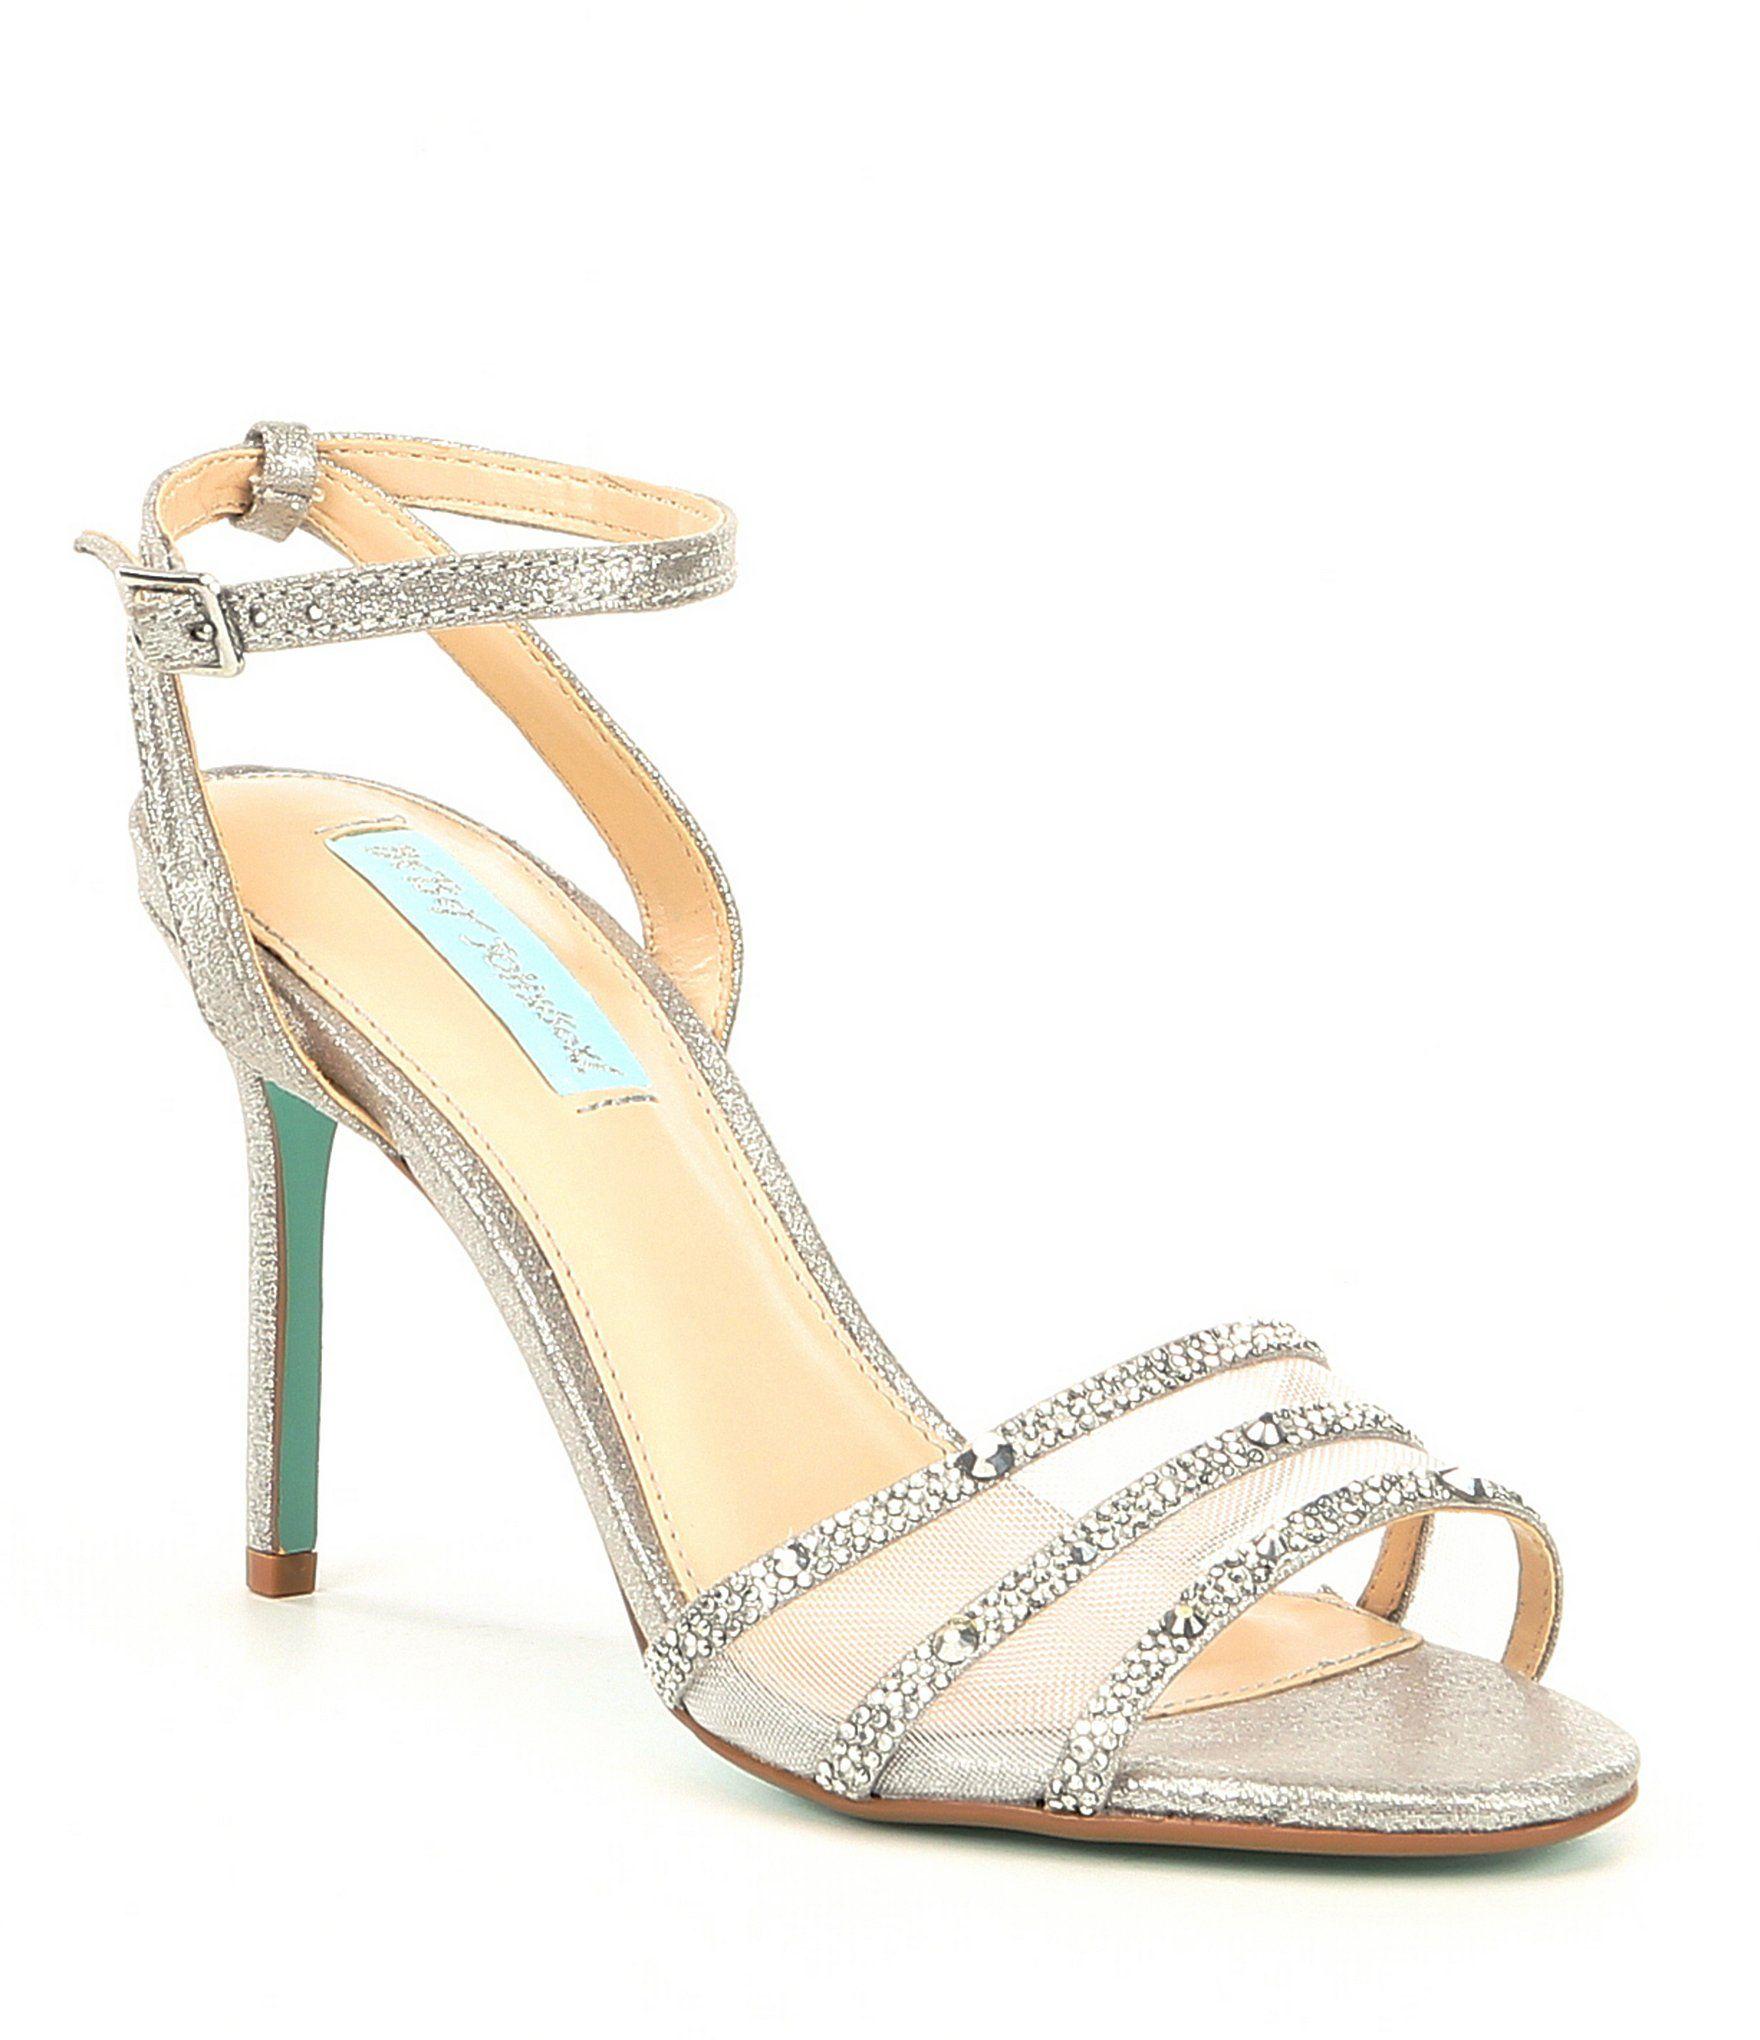 f99dab66070 Blue by Betsey Johnson Veda Jeweled Mesh Dress Sandals  Dillards